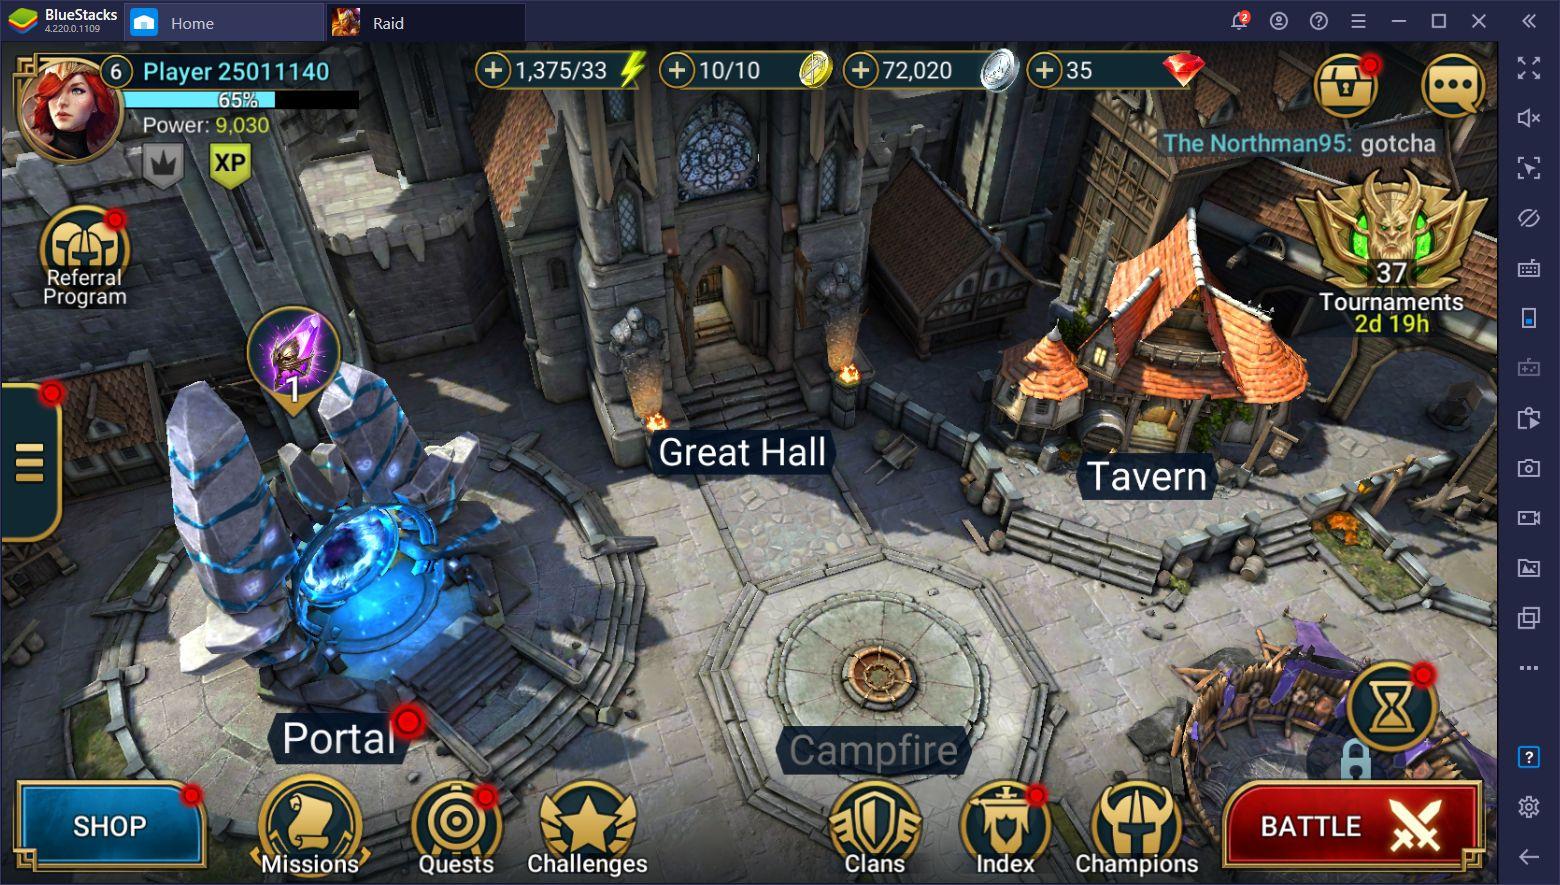 RAID: Shadow Legends – วิธีการฟาร์ม XP, เงิน และทรัพยากรต่างๆ